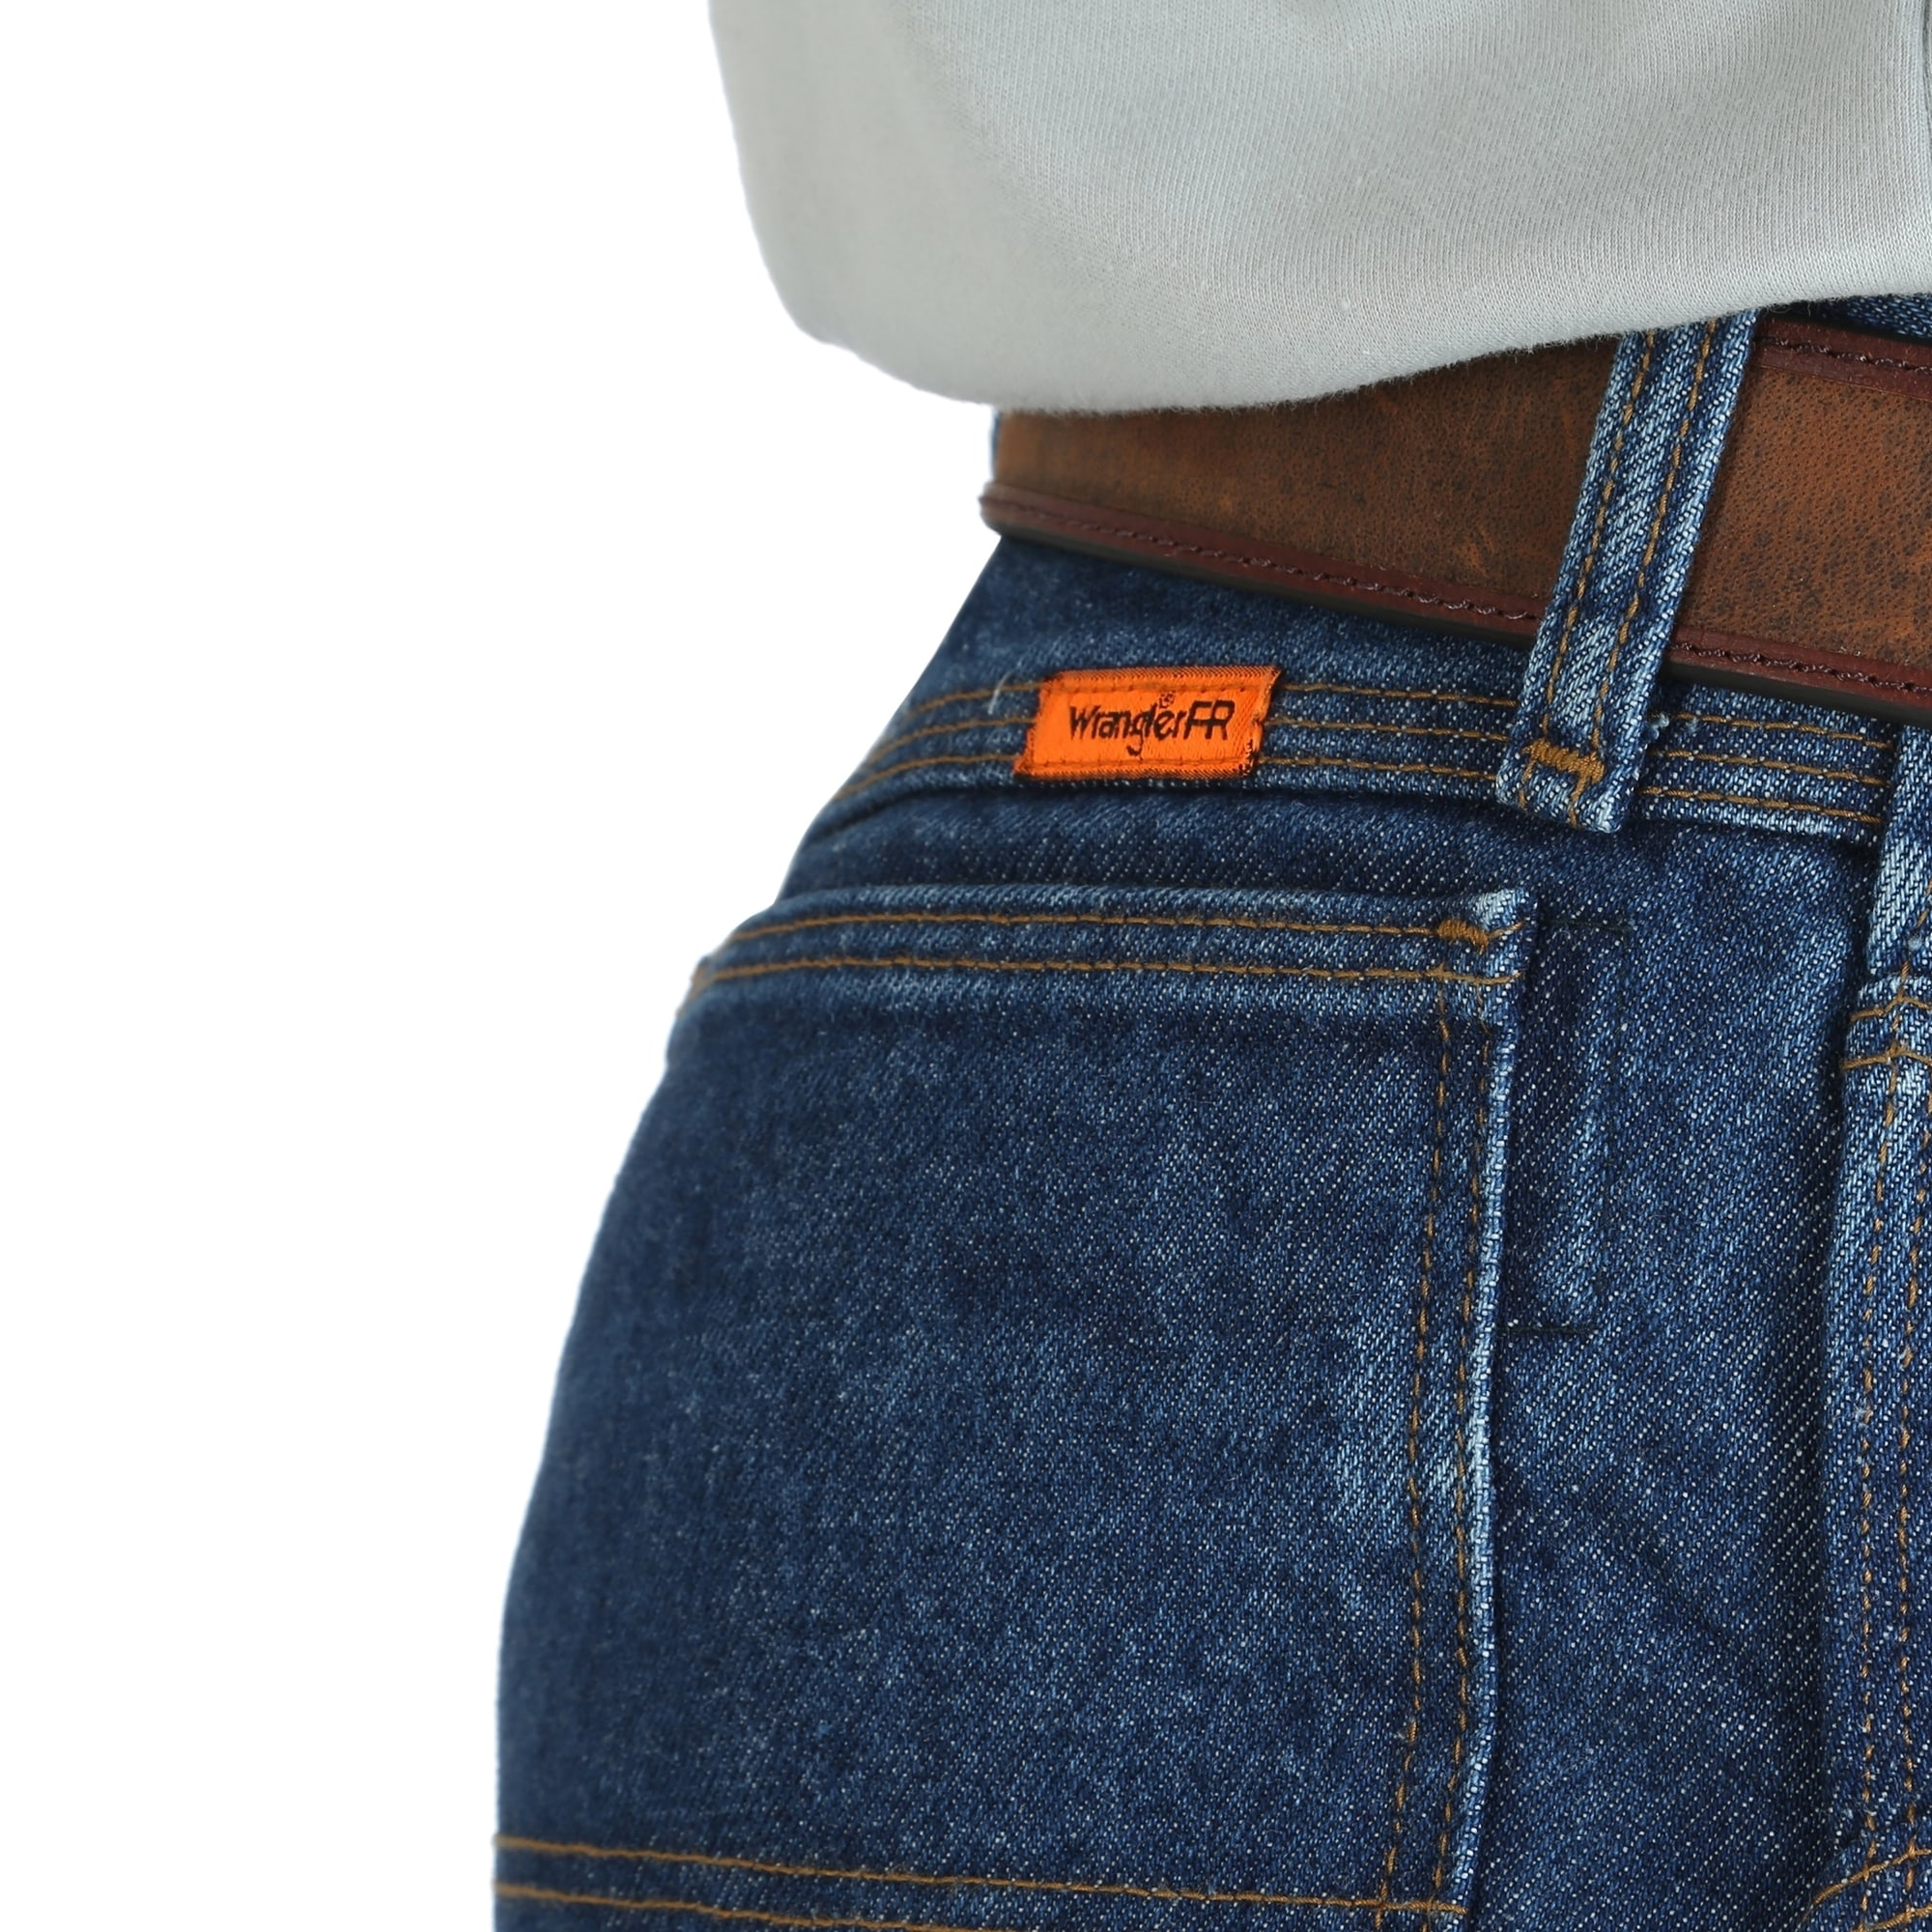 Wrangler FR 32 X 38 Prewash Denim Cotton Heavy Weight Flame Resistant Jeans With Zipper Front Closure